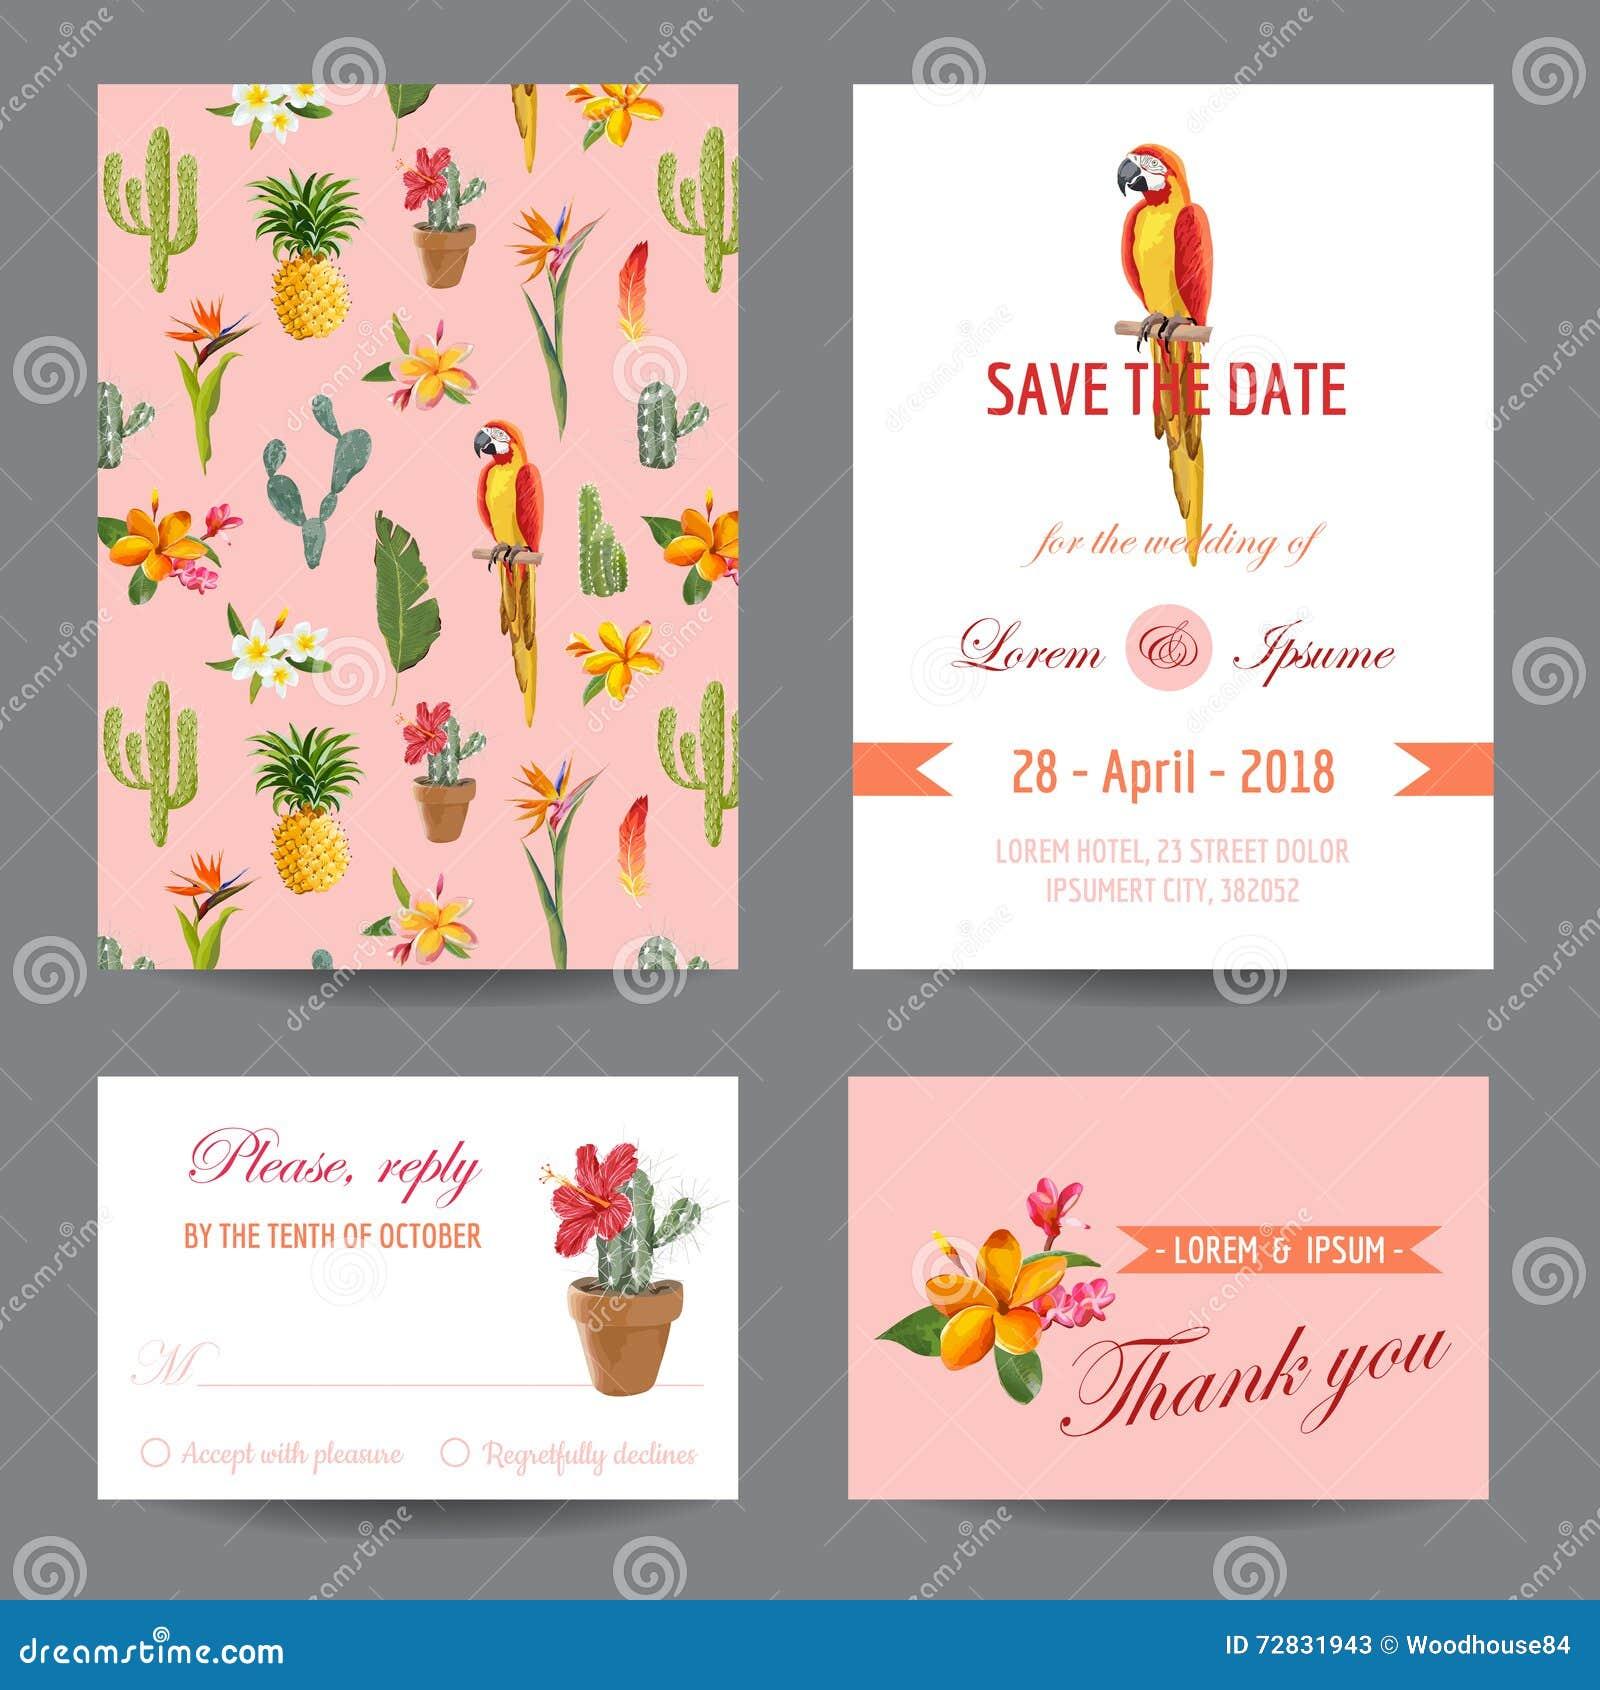 Invitation Card Save The Date Card Wedding Card Stock Vector